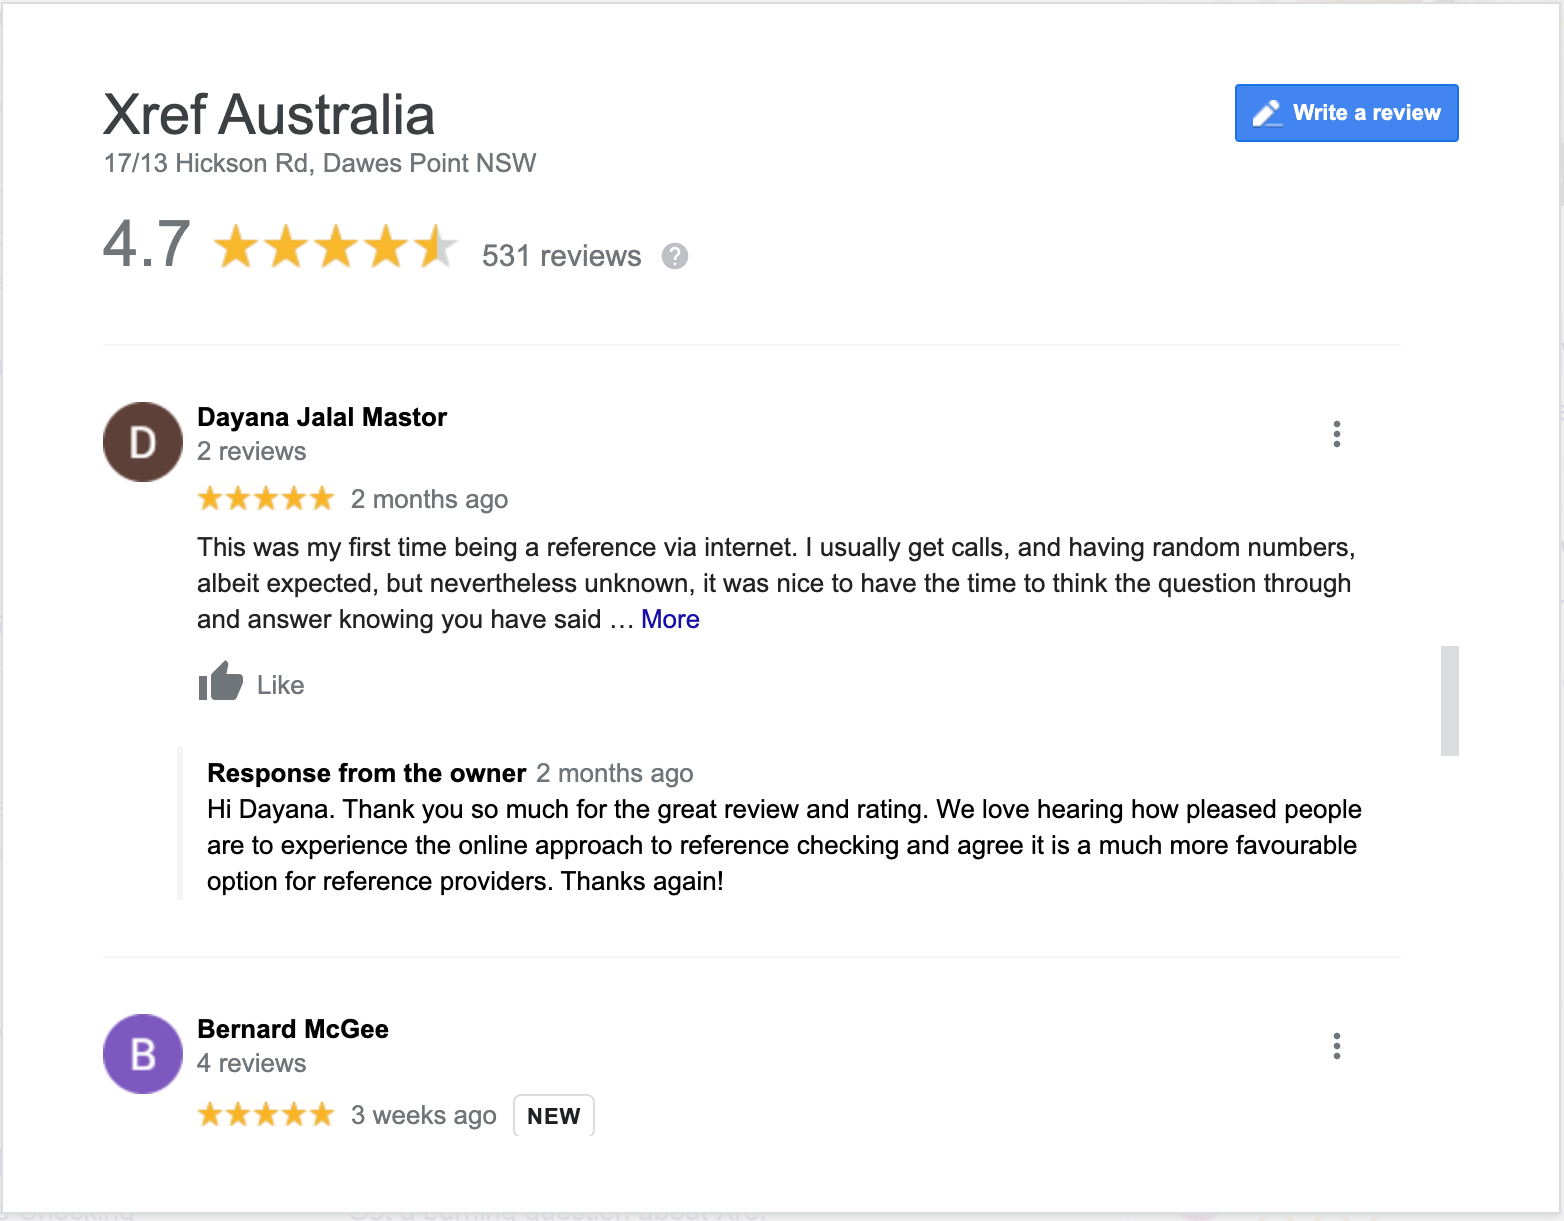 Google review by Dayana Jalal Mastor